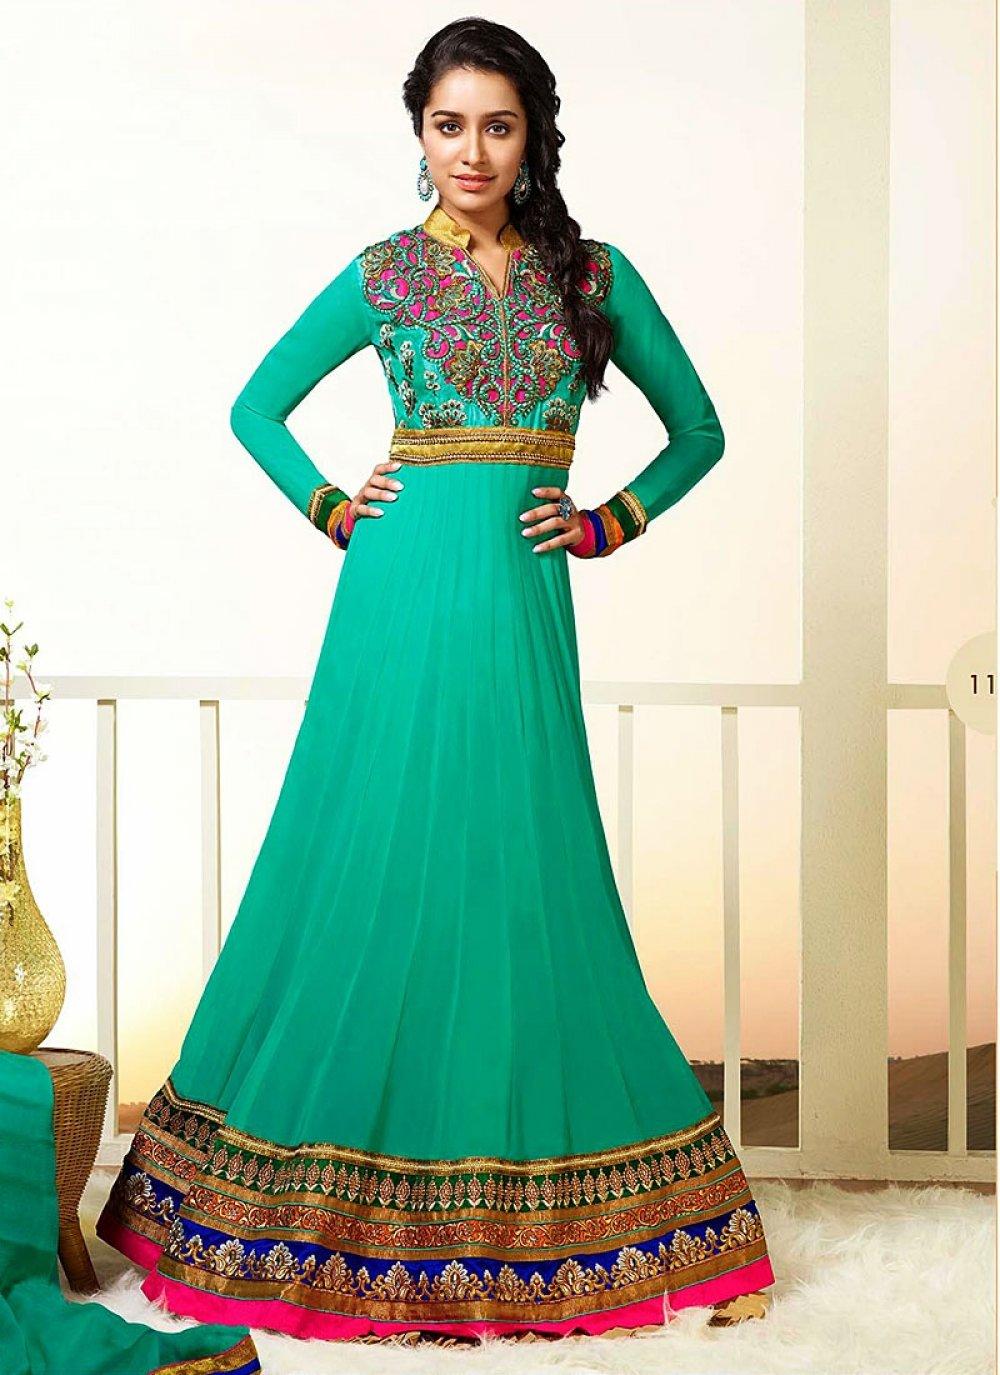 Shraddha Kapoor Sea Green Cut Work Georgette Anarkali Suit